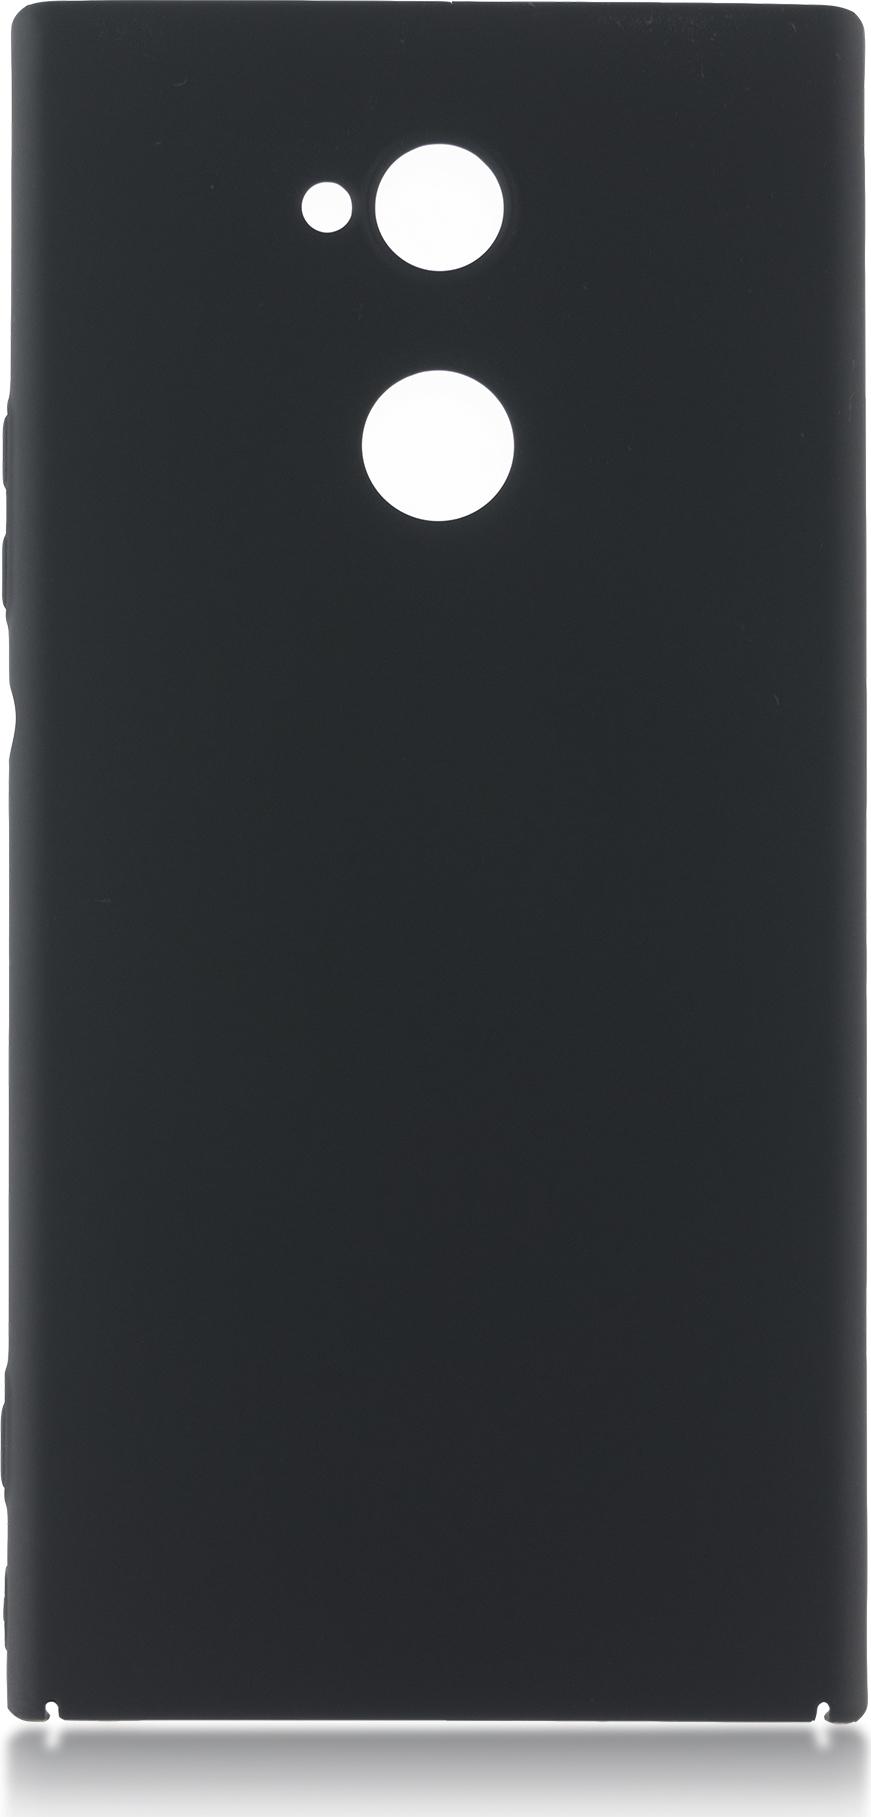 Чехол Brosco 4Side Soft-Touch для Sony Xperia XA2 Ultra, черный чехол для сотового телефона brosco для sony xa2 ultra xa2u book gold золотой